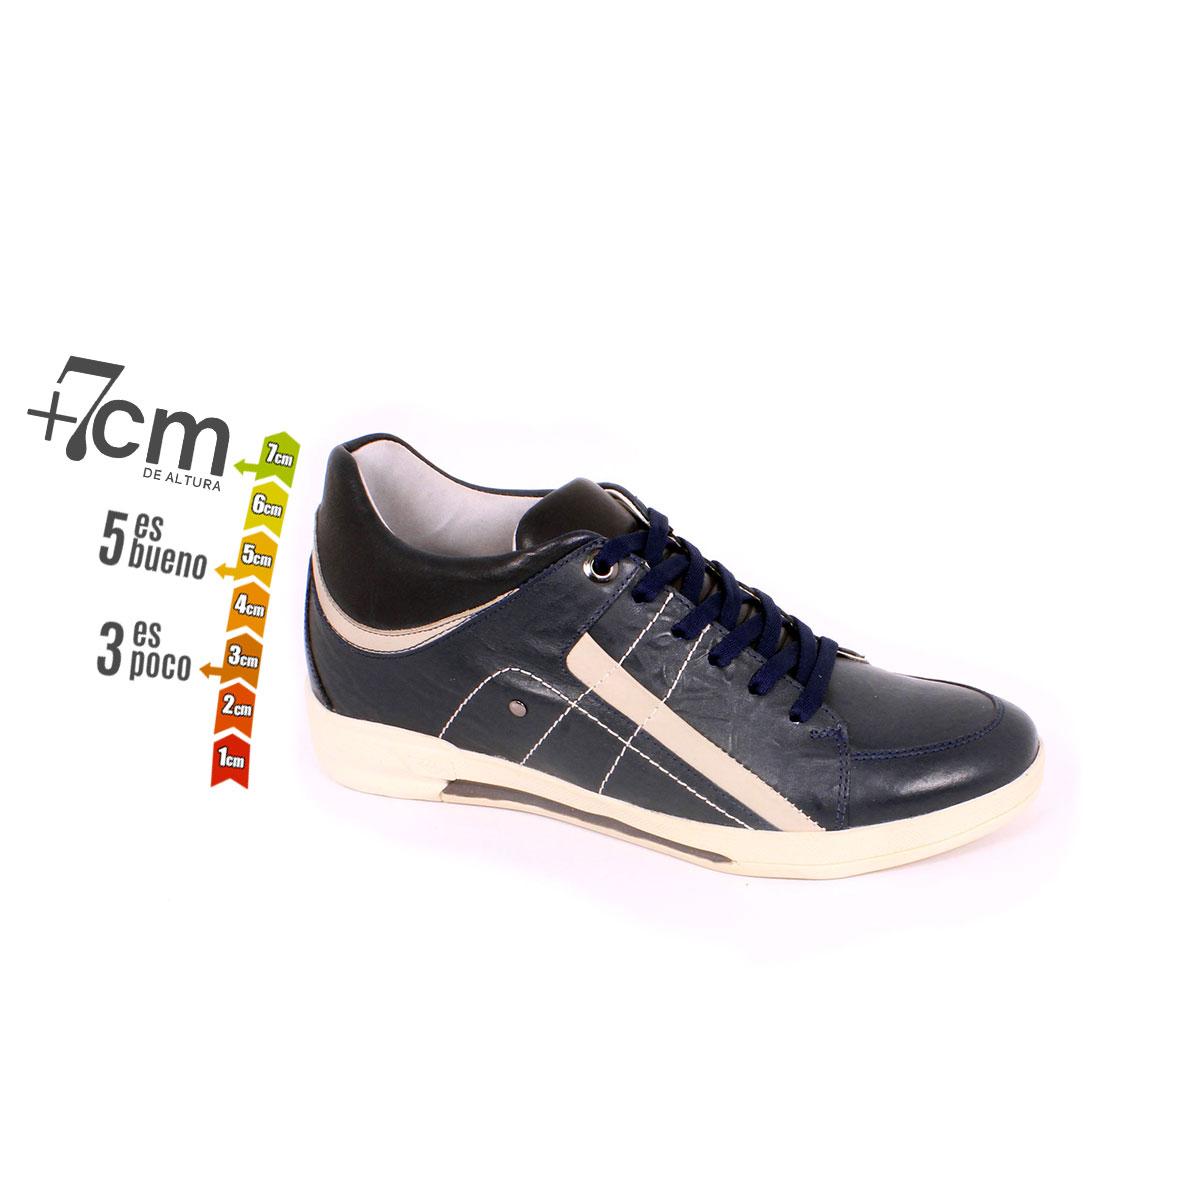 Zapato Casual Street Azul Max Denegri +7cm de Altura_74114